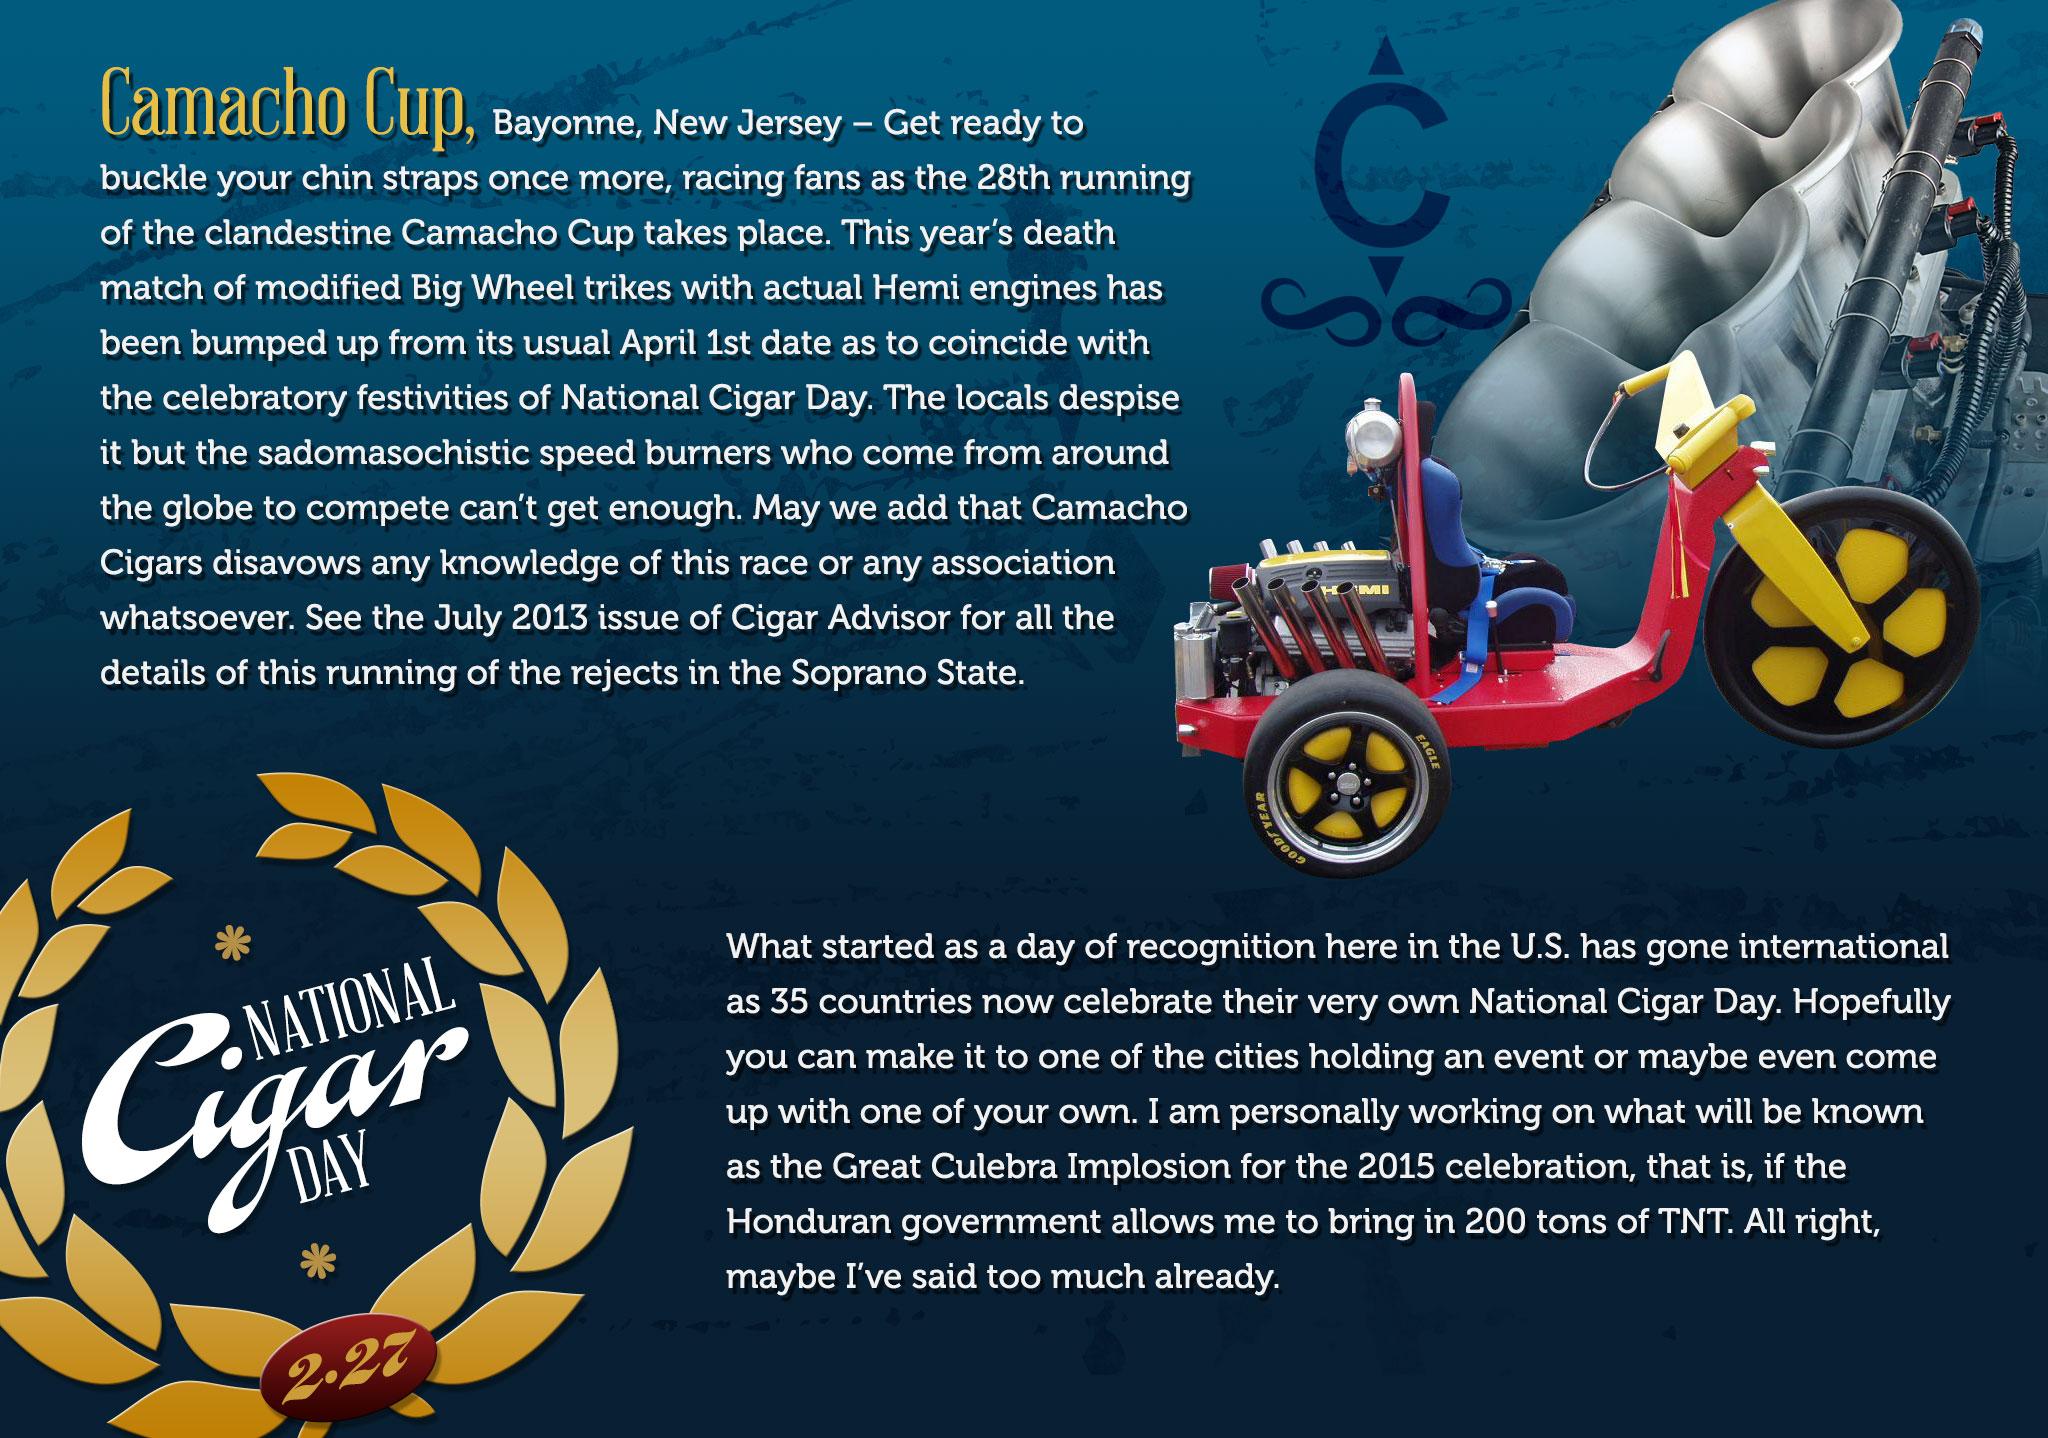 National Cigar Day - Camacho Cup